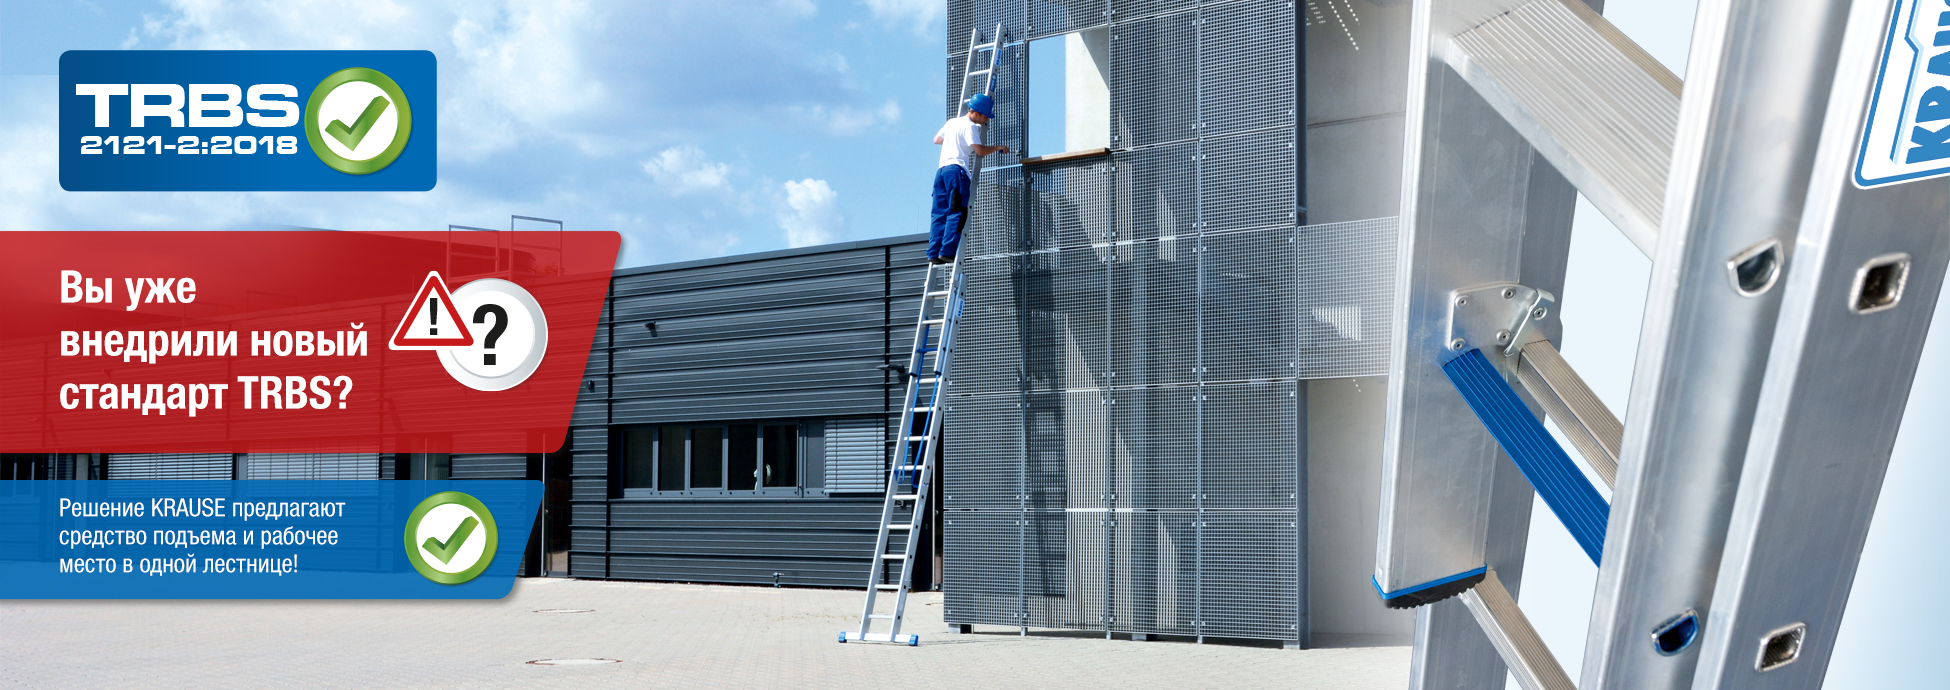 TRBS 2121 Часть 2 – Реформа технических правил для безопасности на производстве